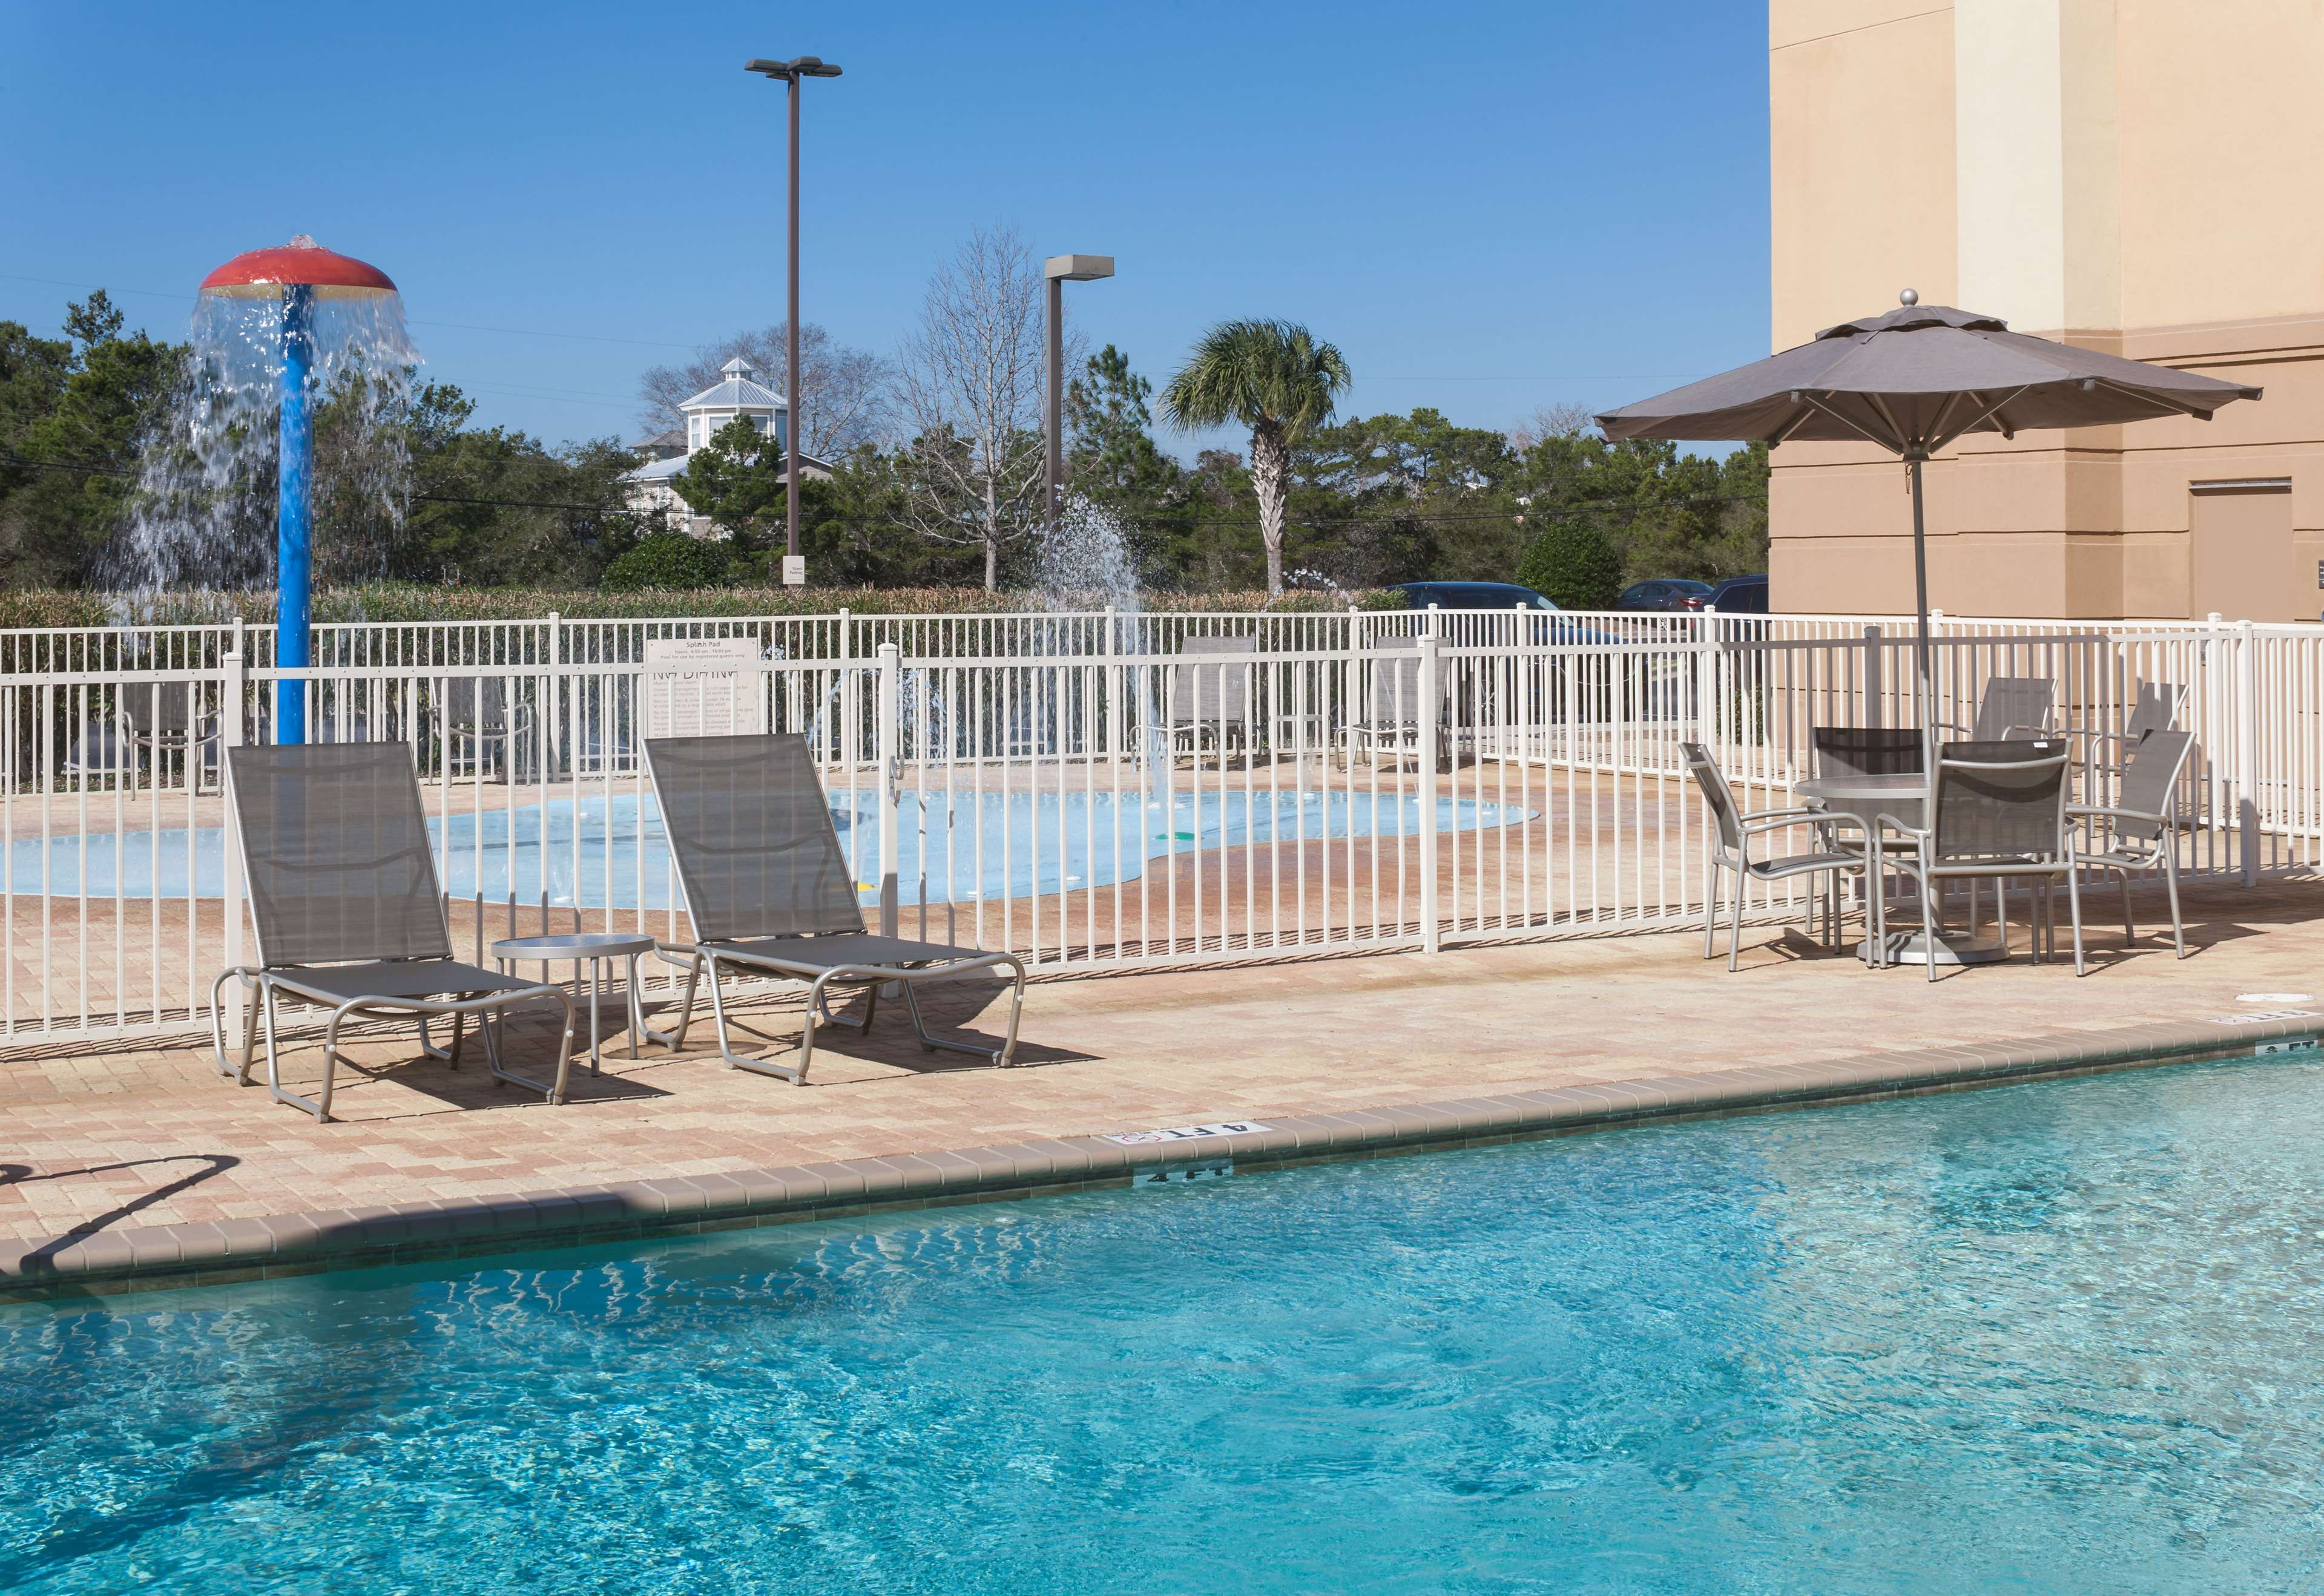 Hampton Inn & Suites Panama City Beach-Pier Park Area image 5